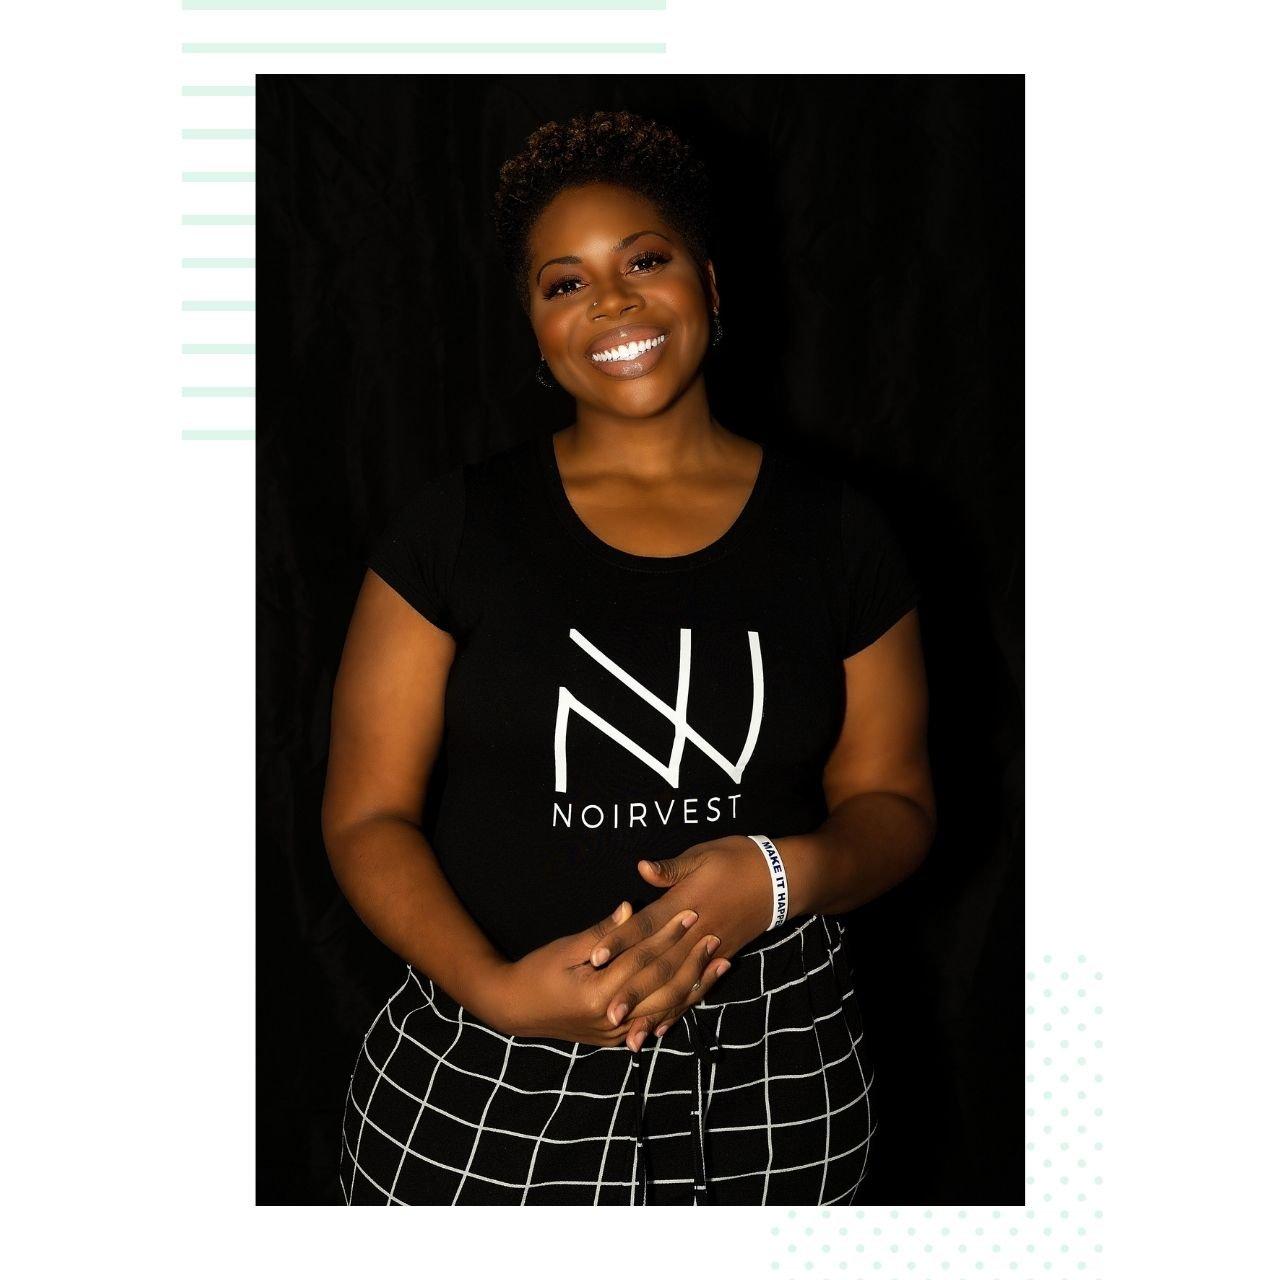 Hi, I'm Nicole Pendergrass - image of Noirvest Holdings owner